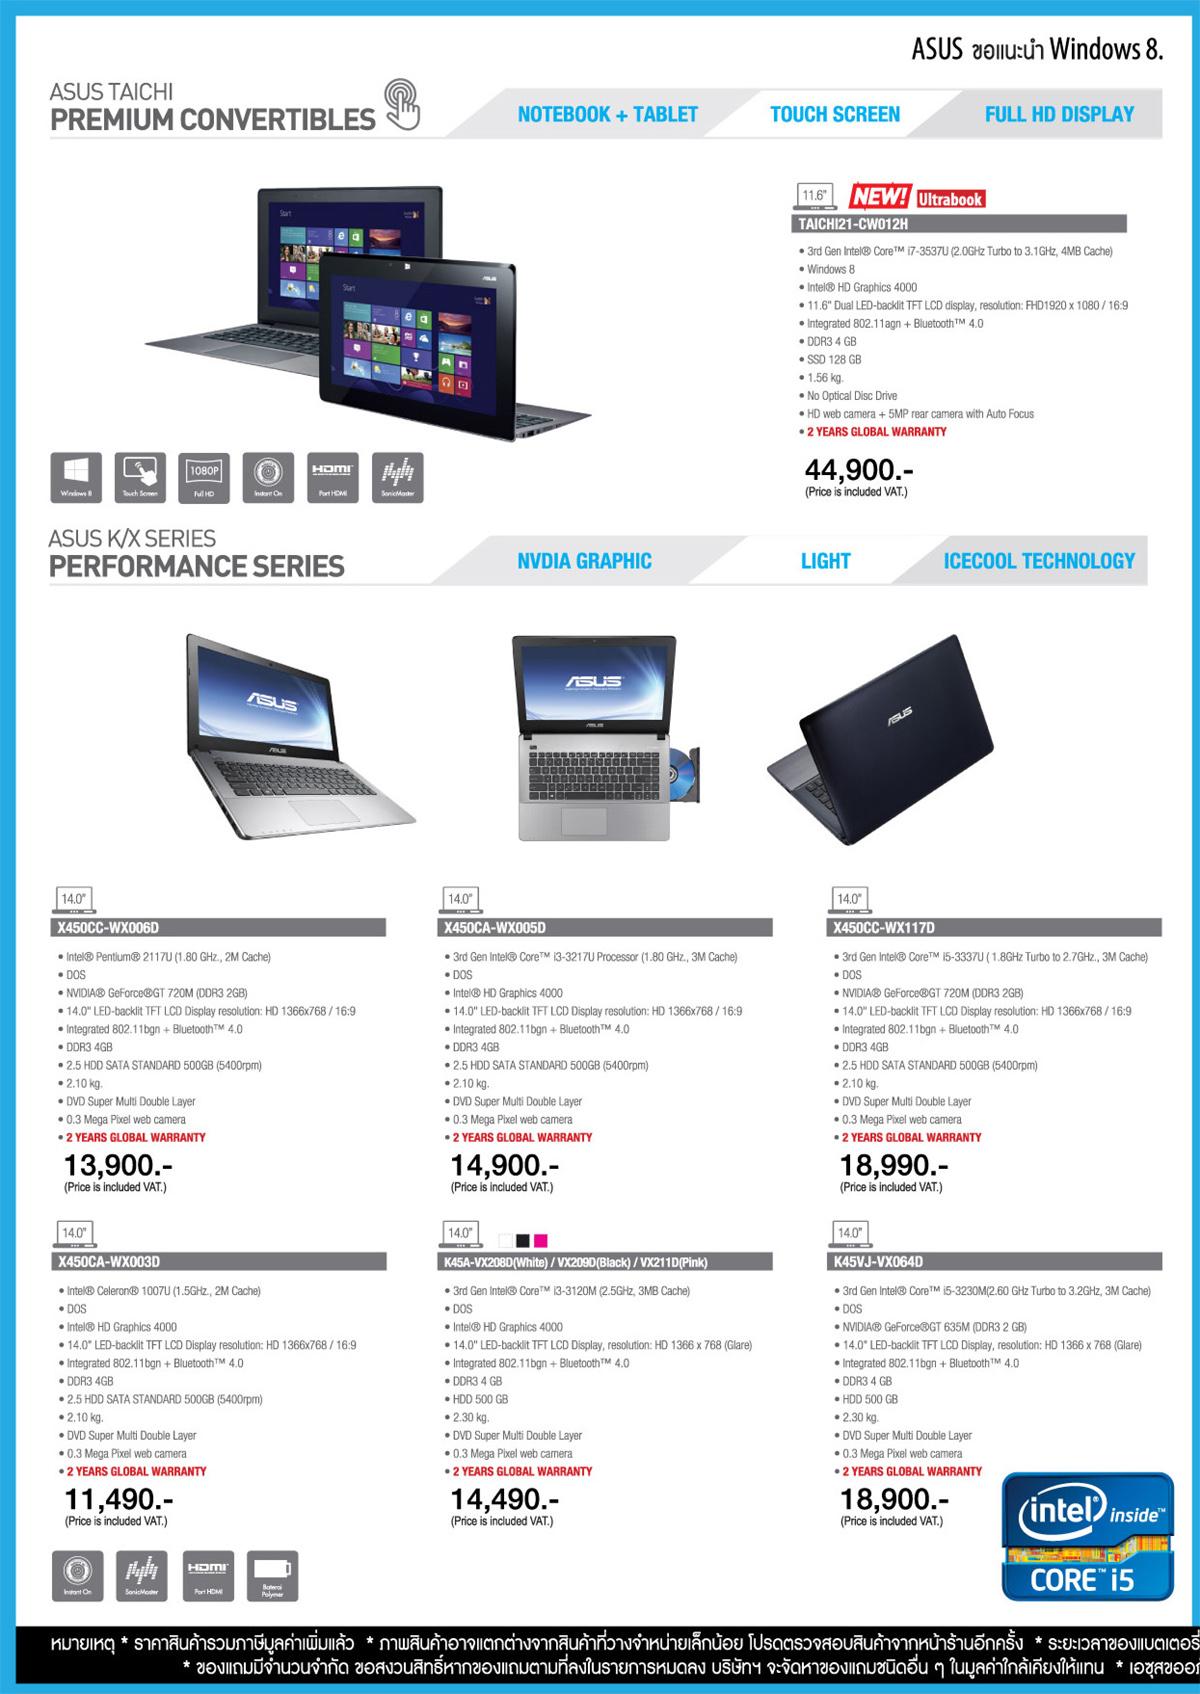 ASUS Leaflet Comp Mobile 2a